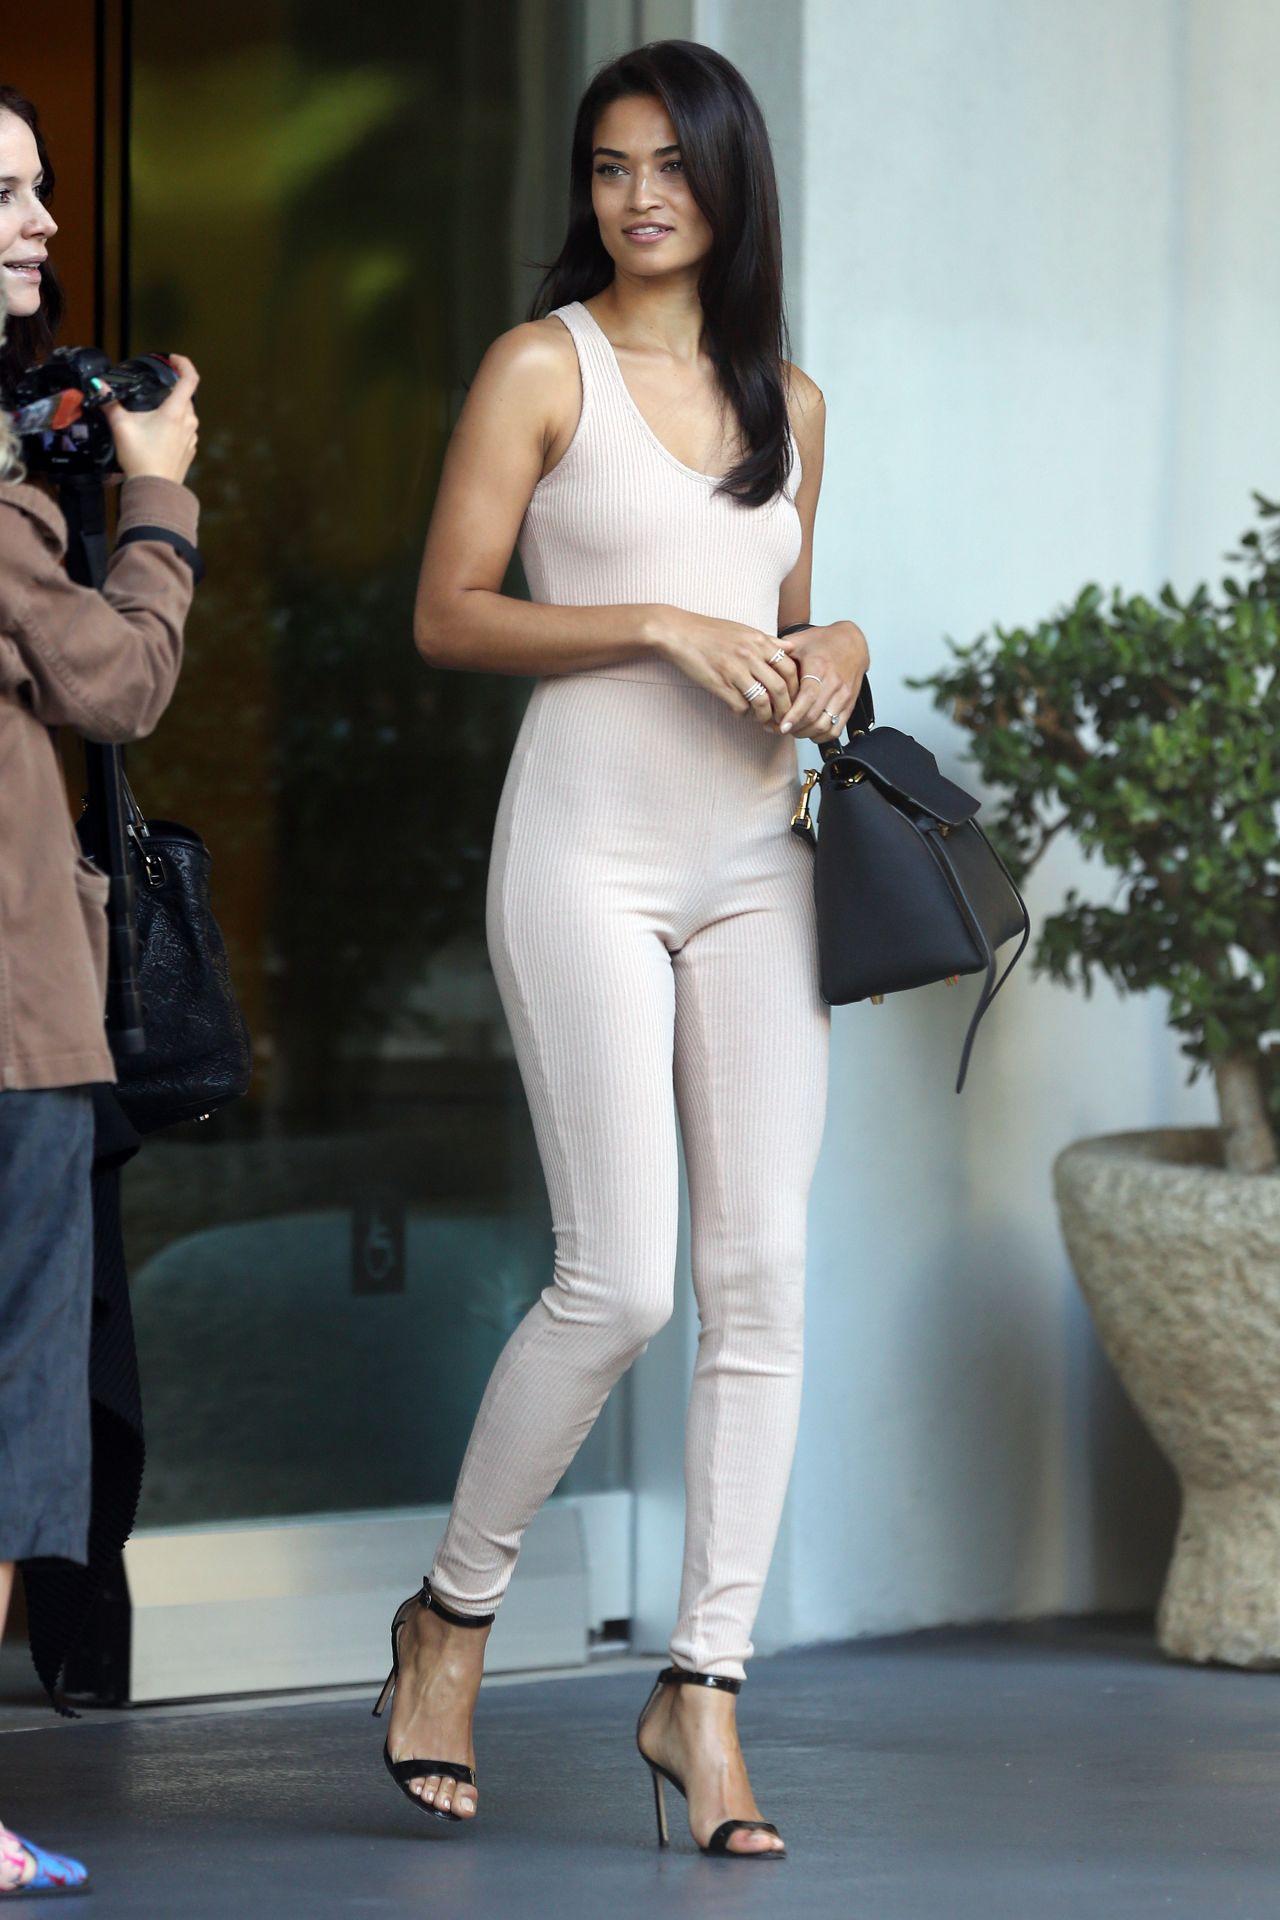 Shanina Shaik Wears a Bodysuit - Leaves a Hotel in Los Angeles, April 2016